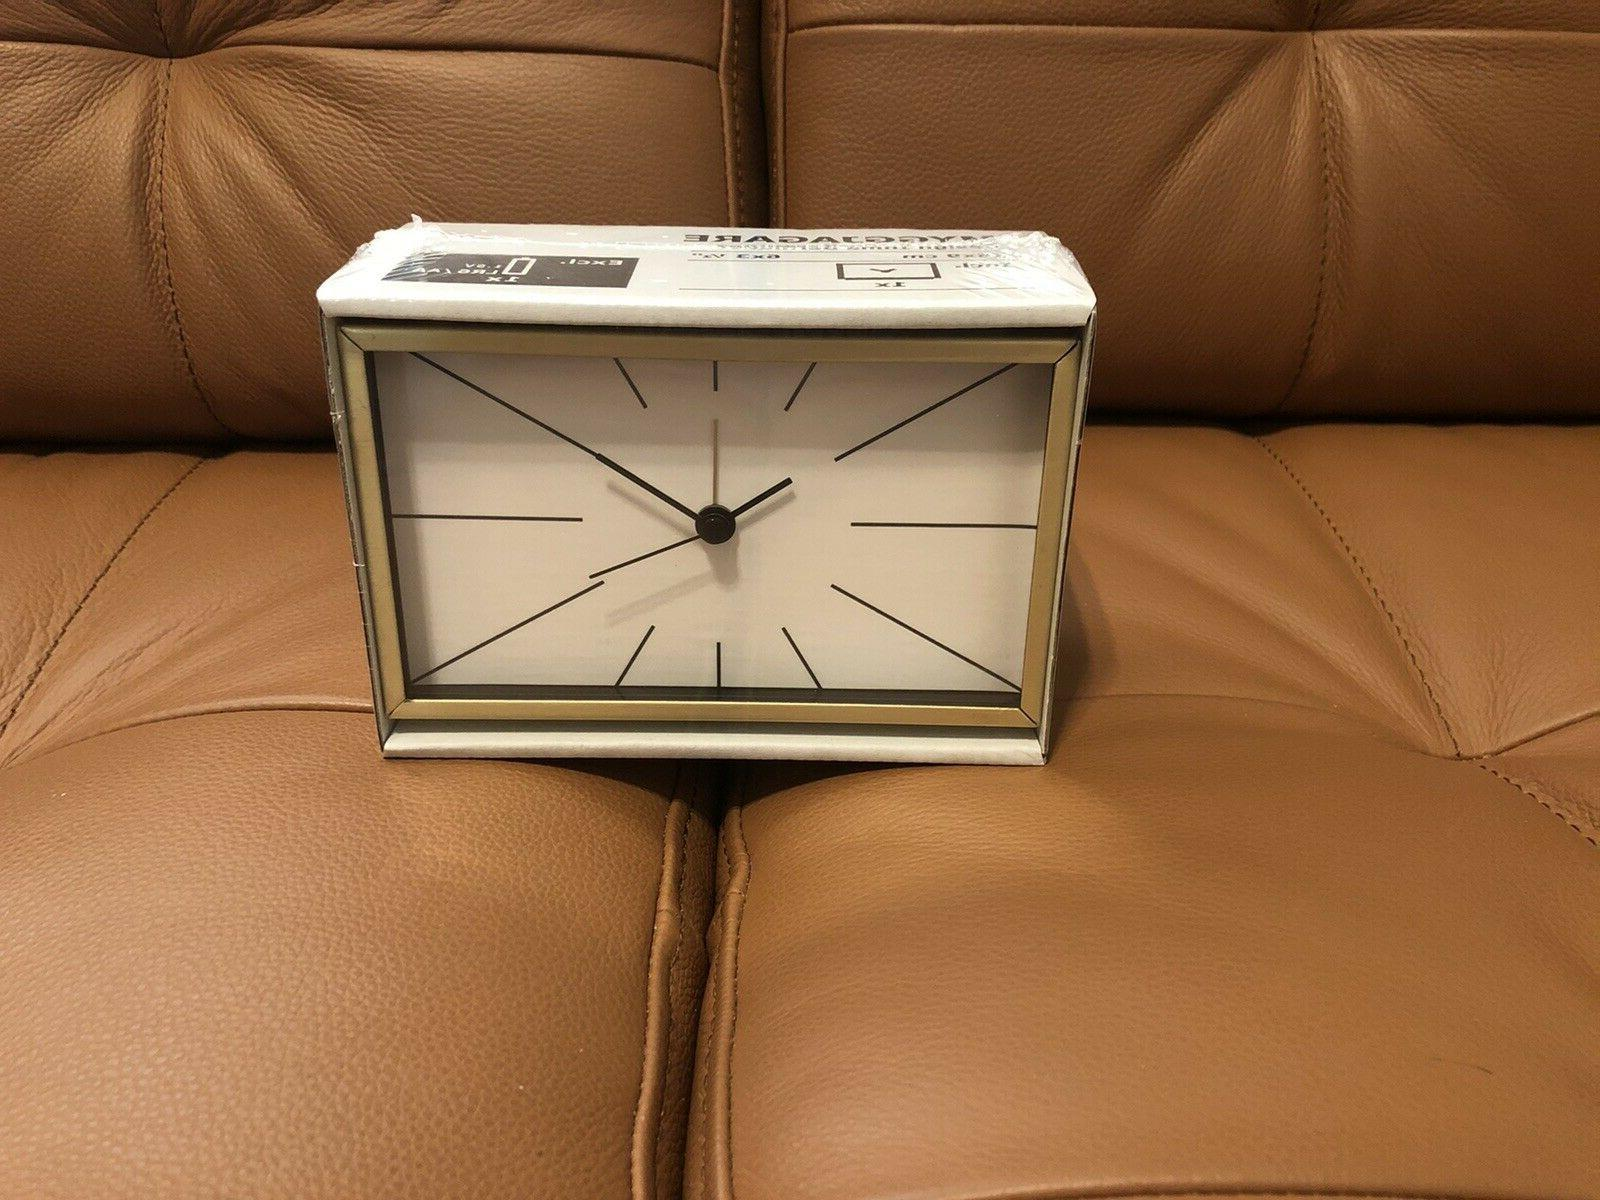 "Ikea Myggjagare Alarm Clock Gold brass Color 6x3 ½ "" 703.74"